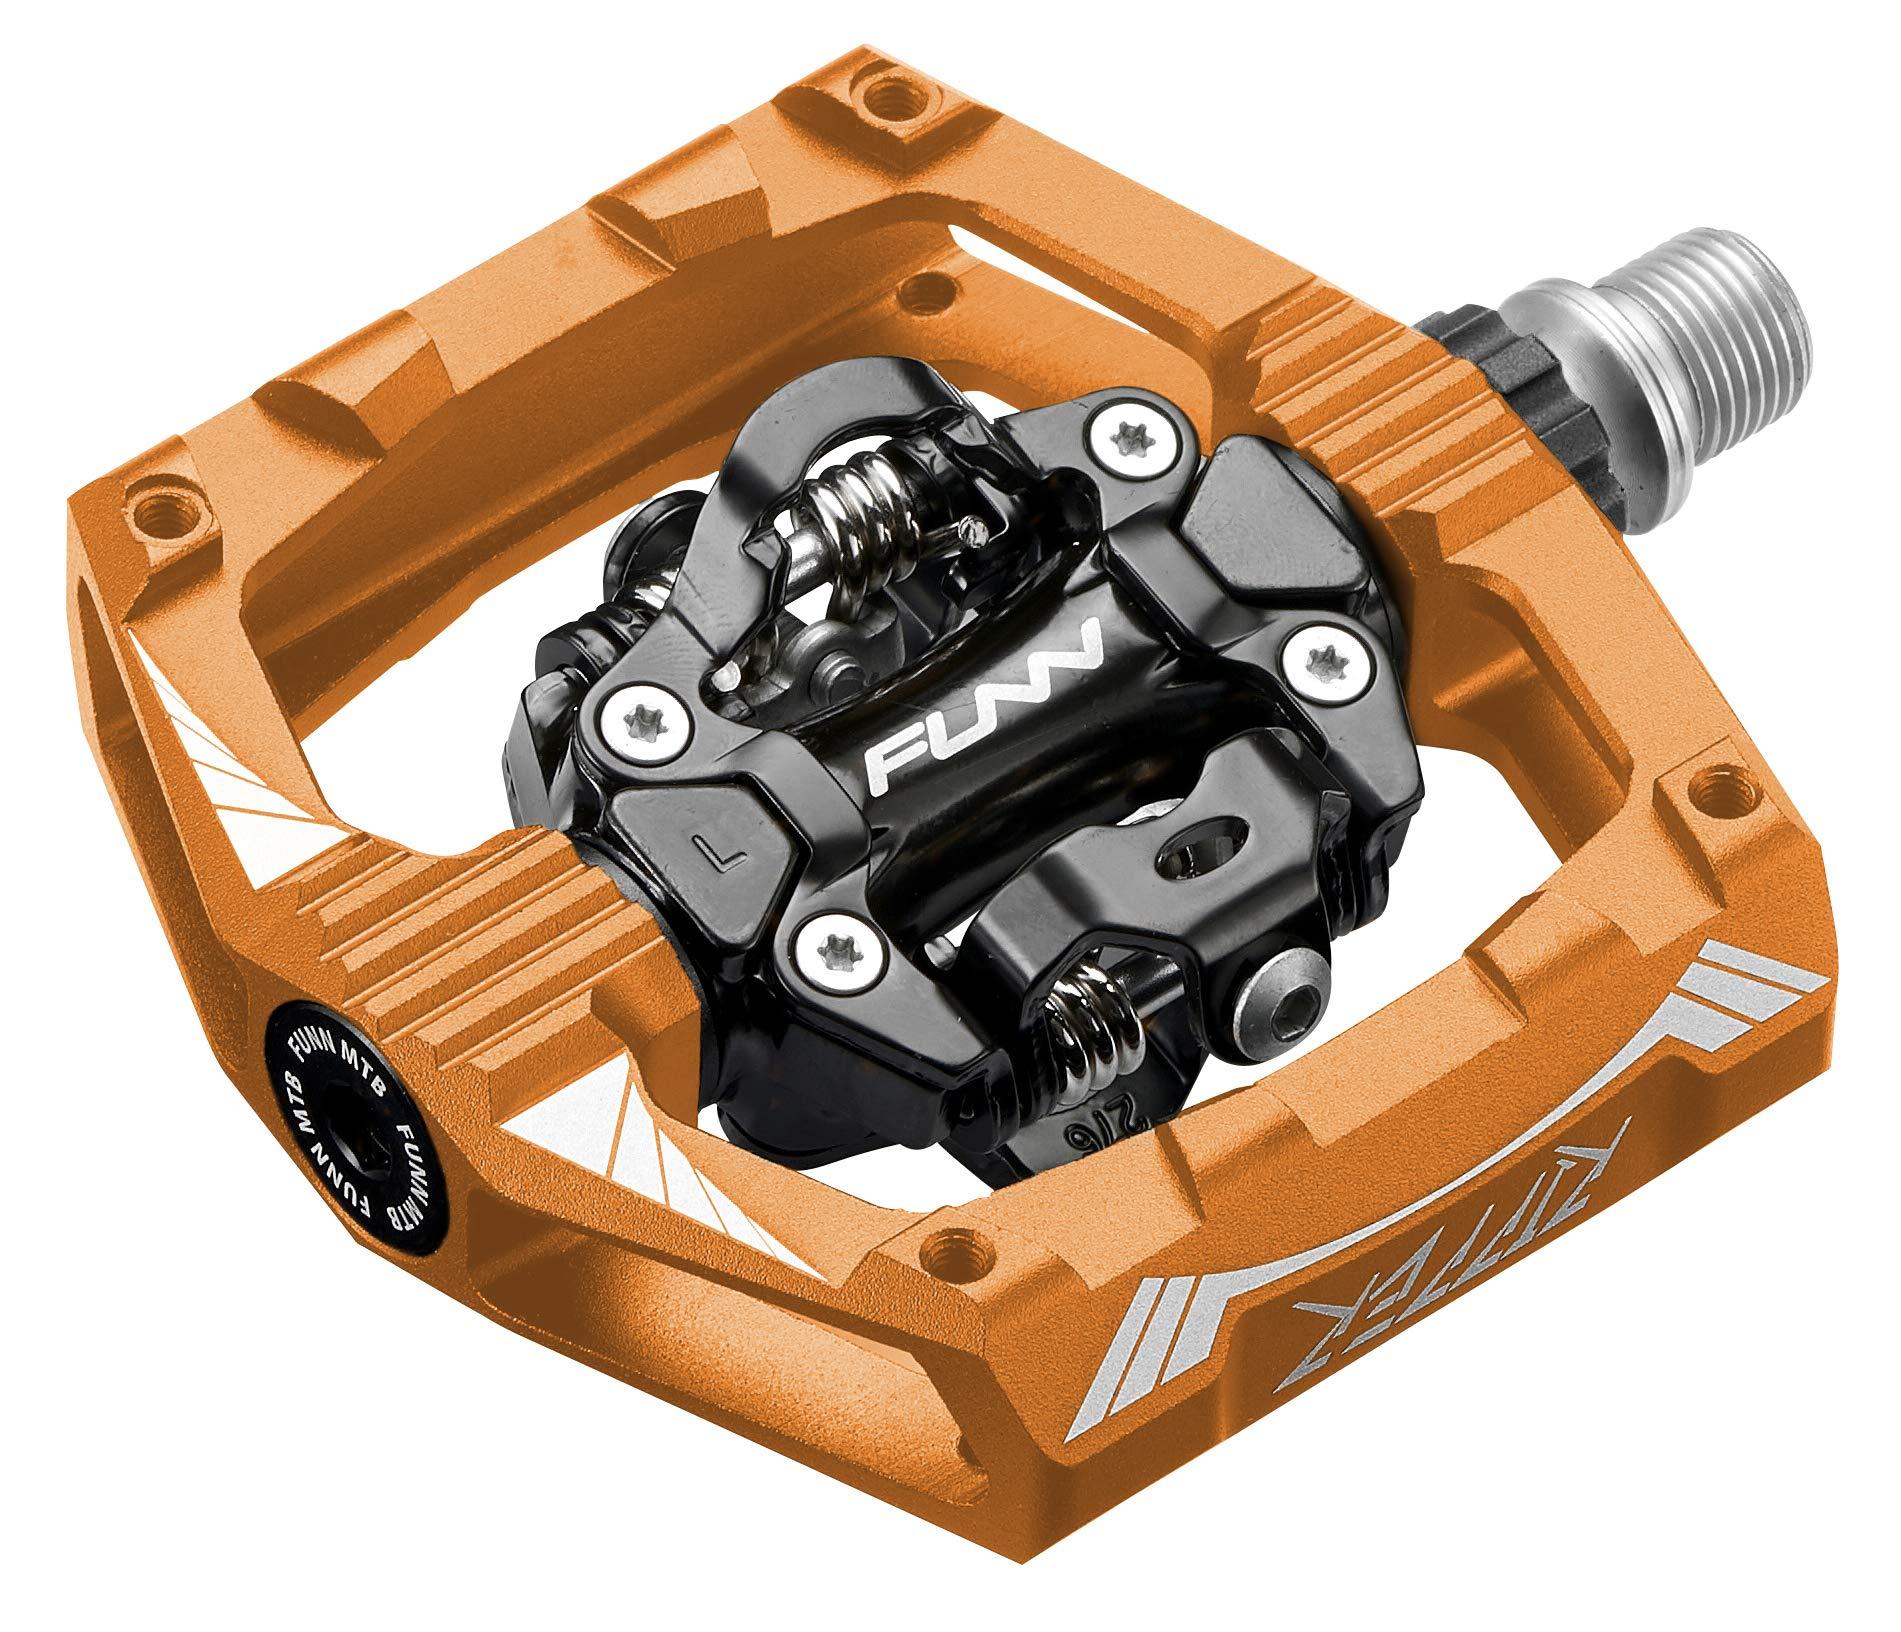 Funn Ripper Clipless Pedal Set, Rocker Clip Mechanism, SPD Compatible (Orange)